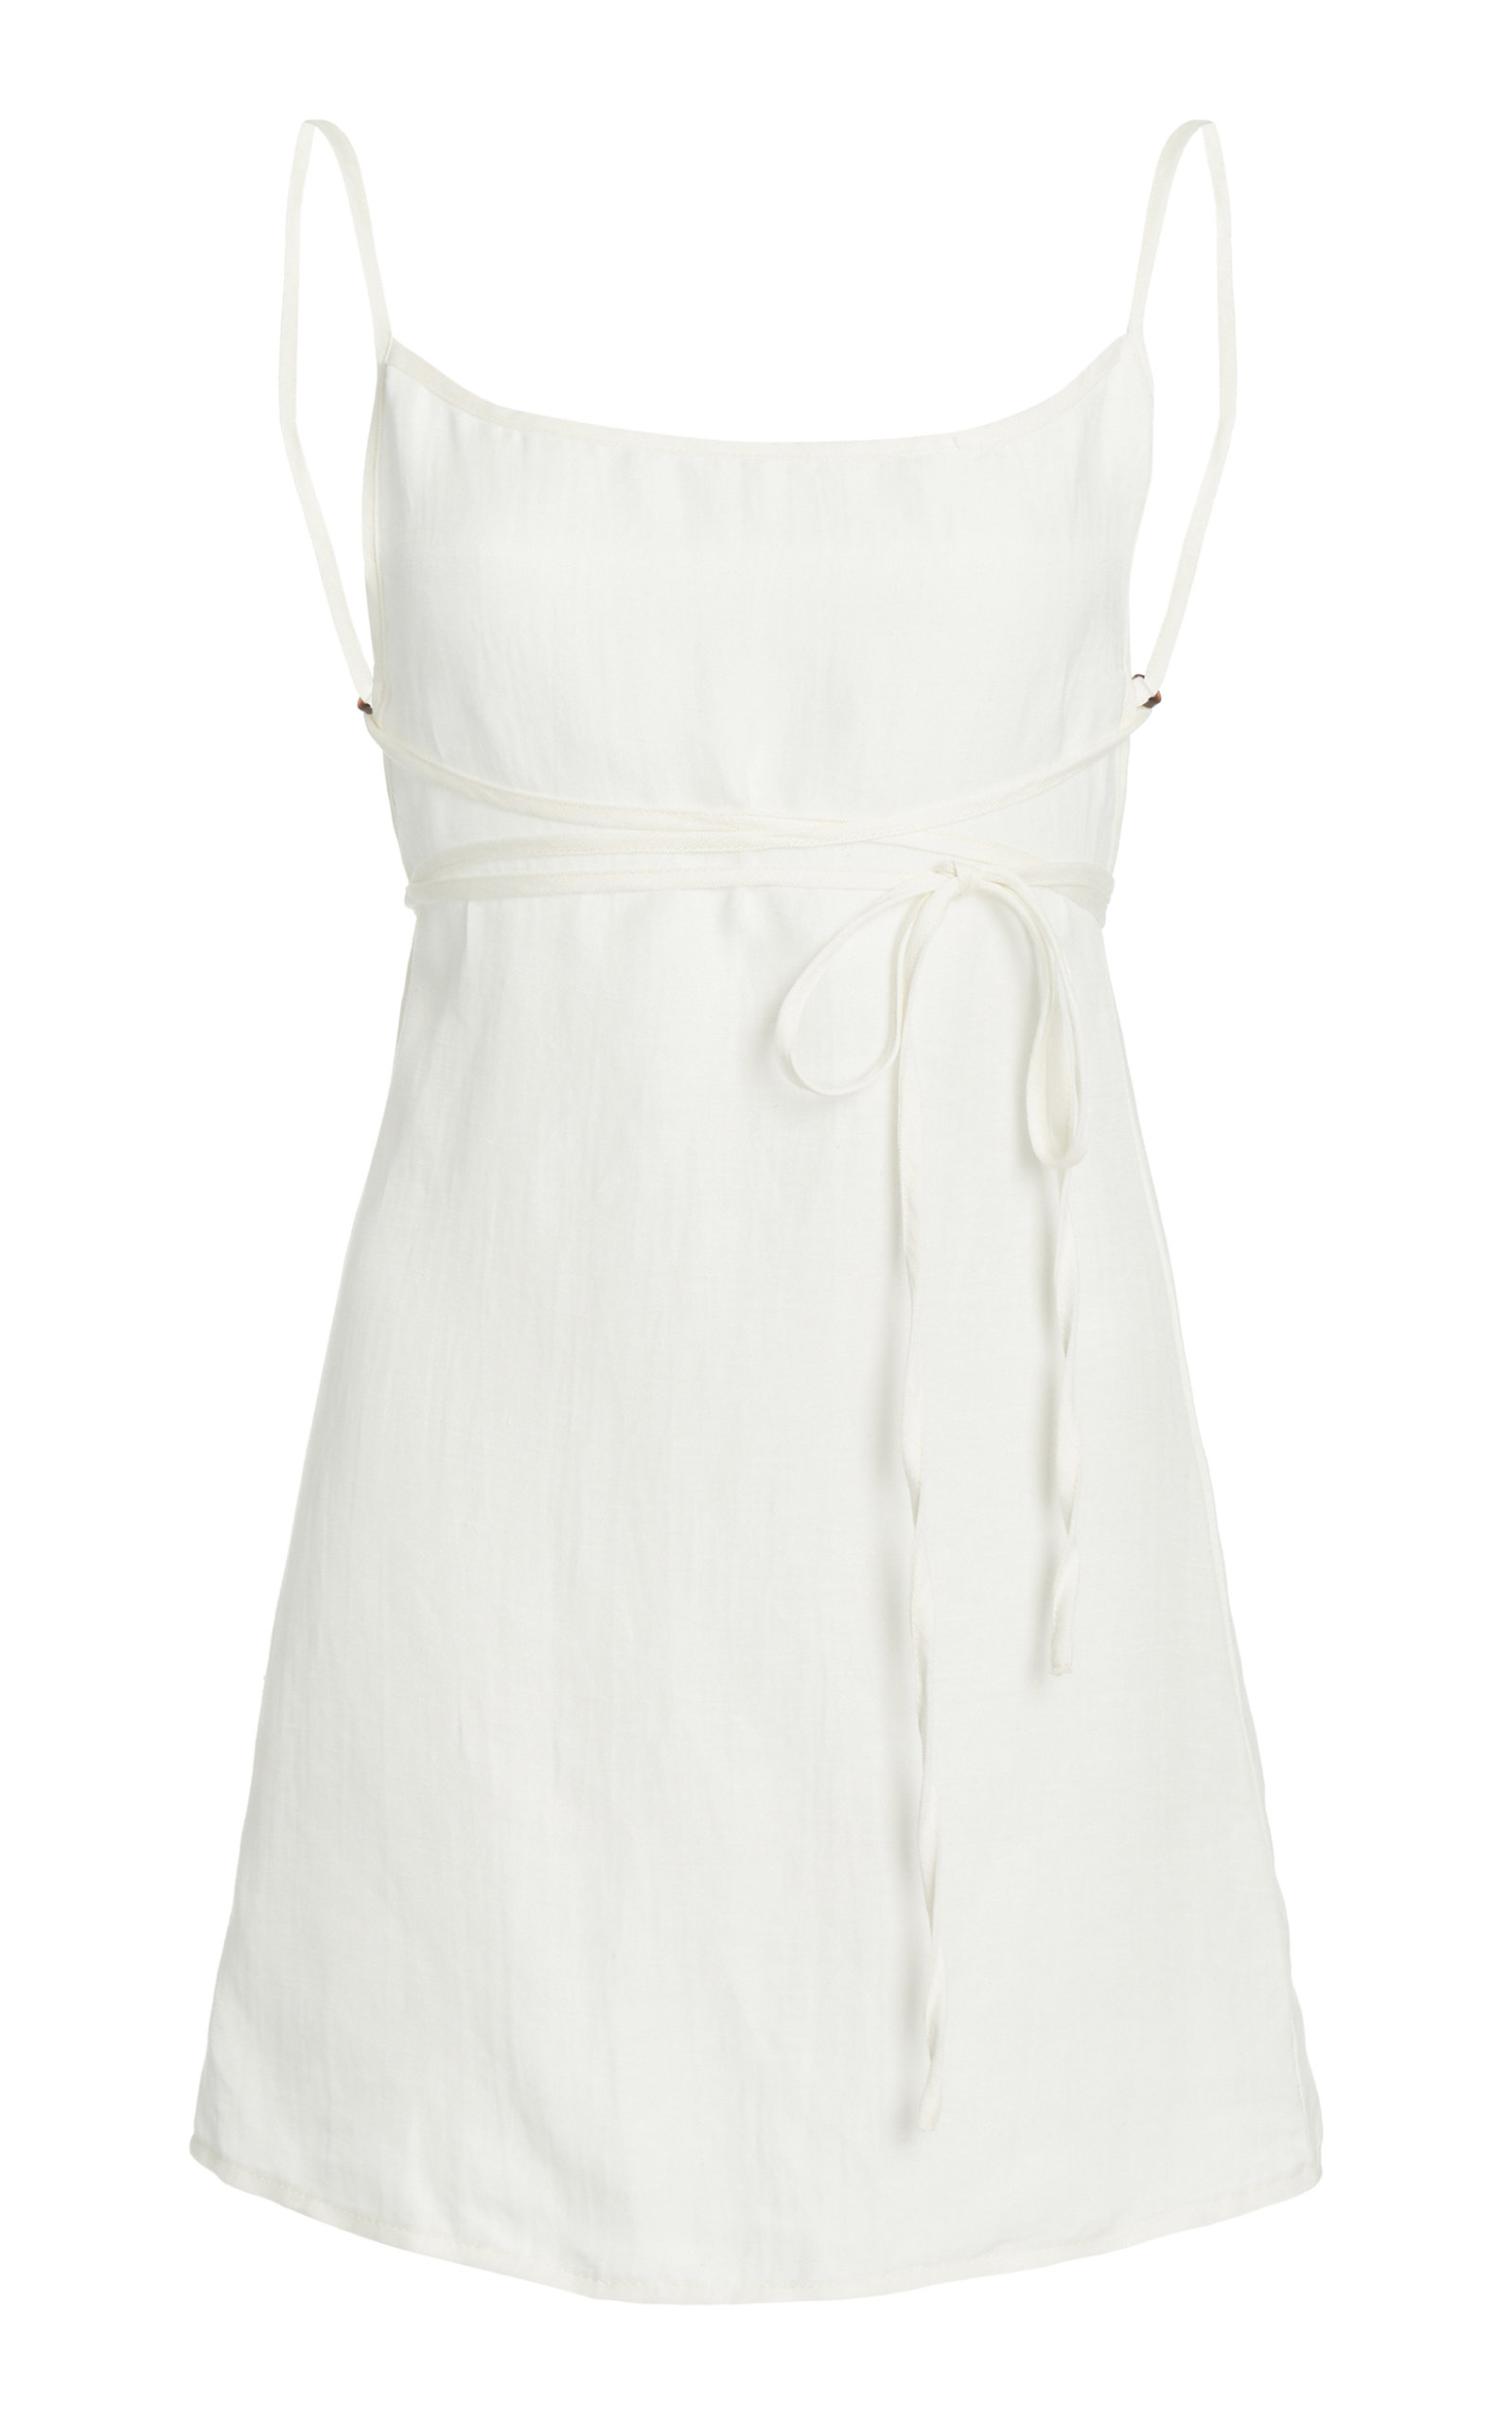 Women's The K.M.Tie Linen Mini Dress